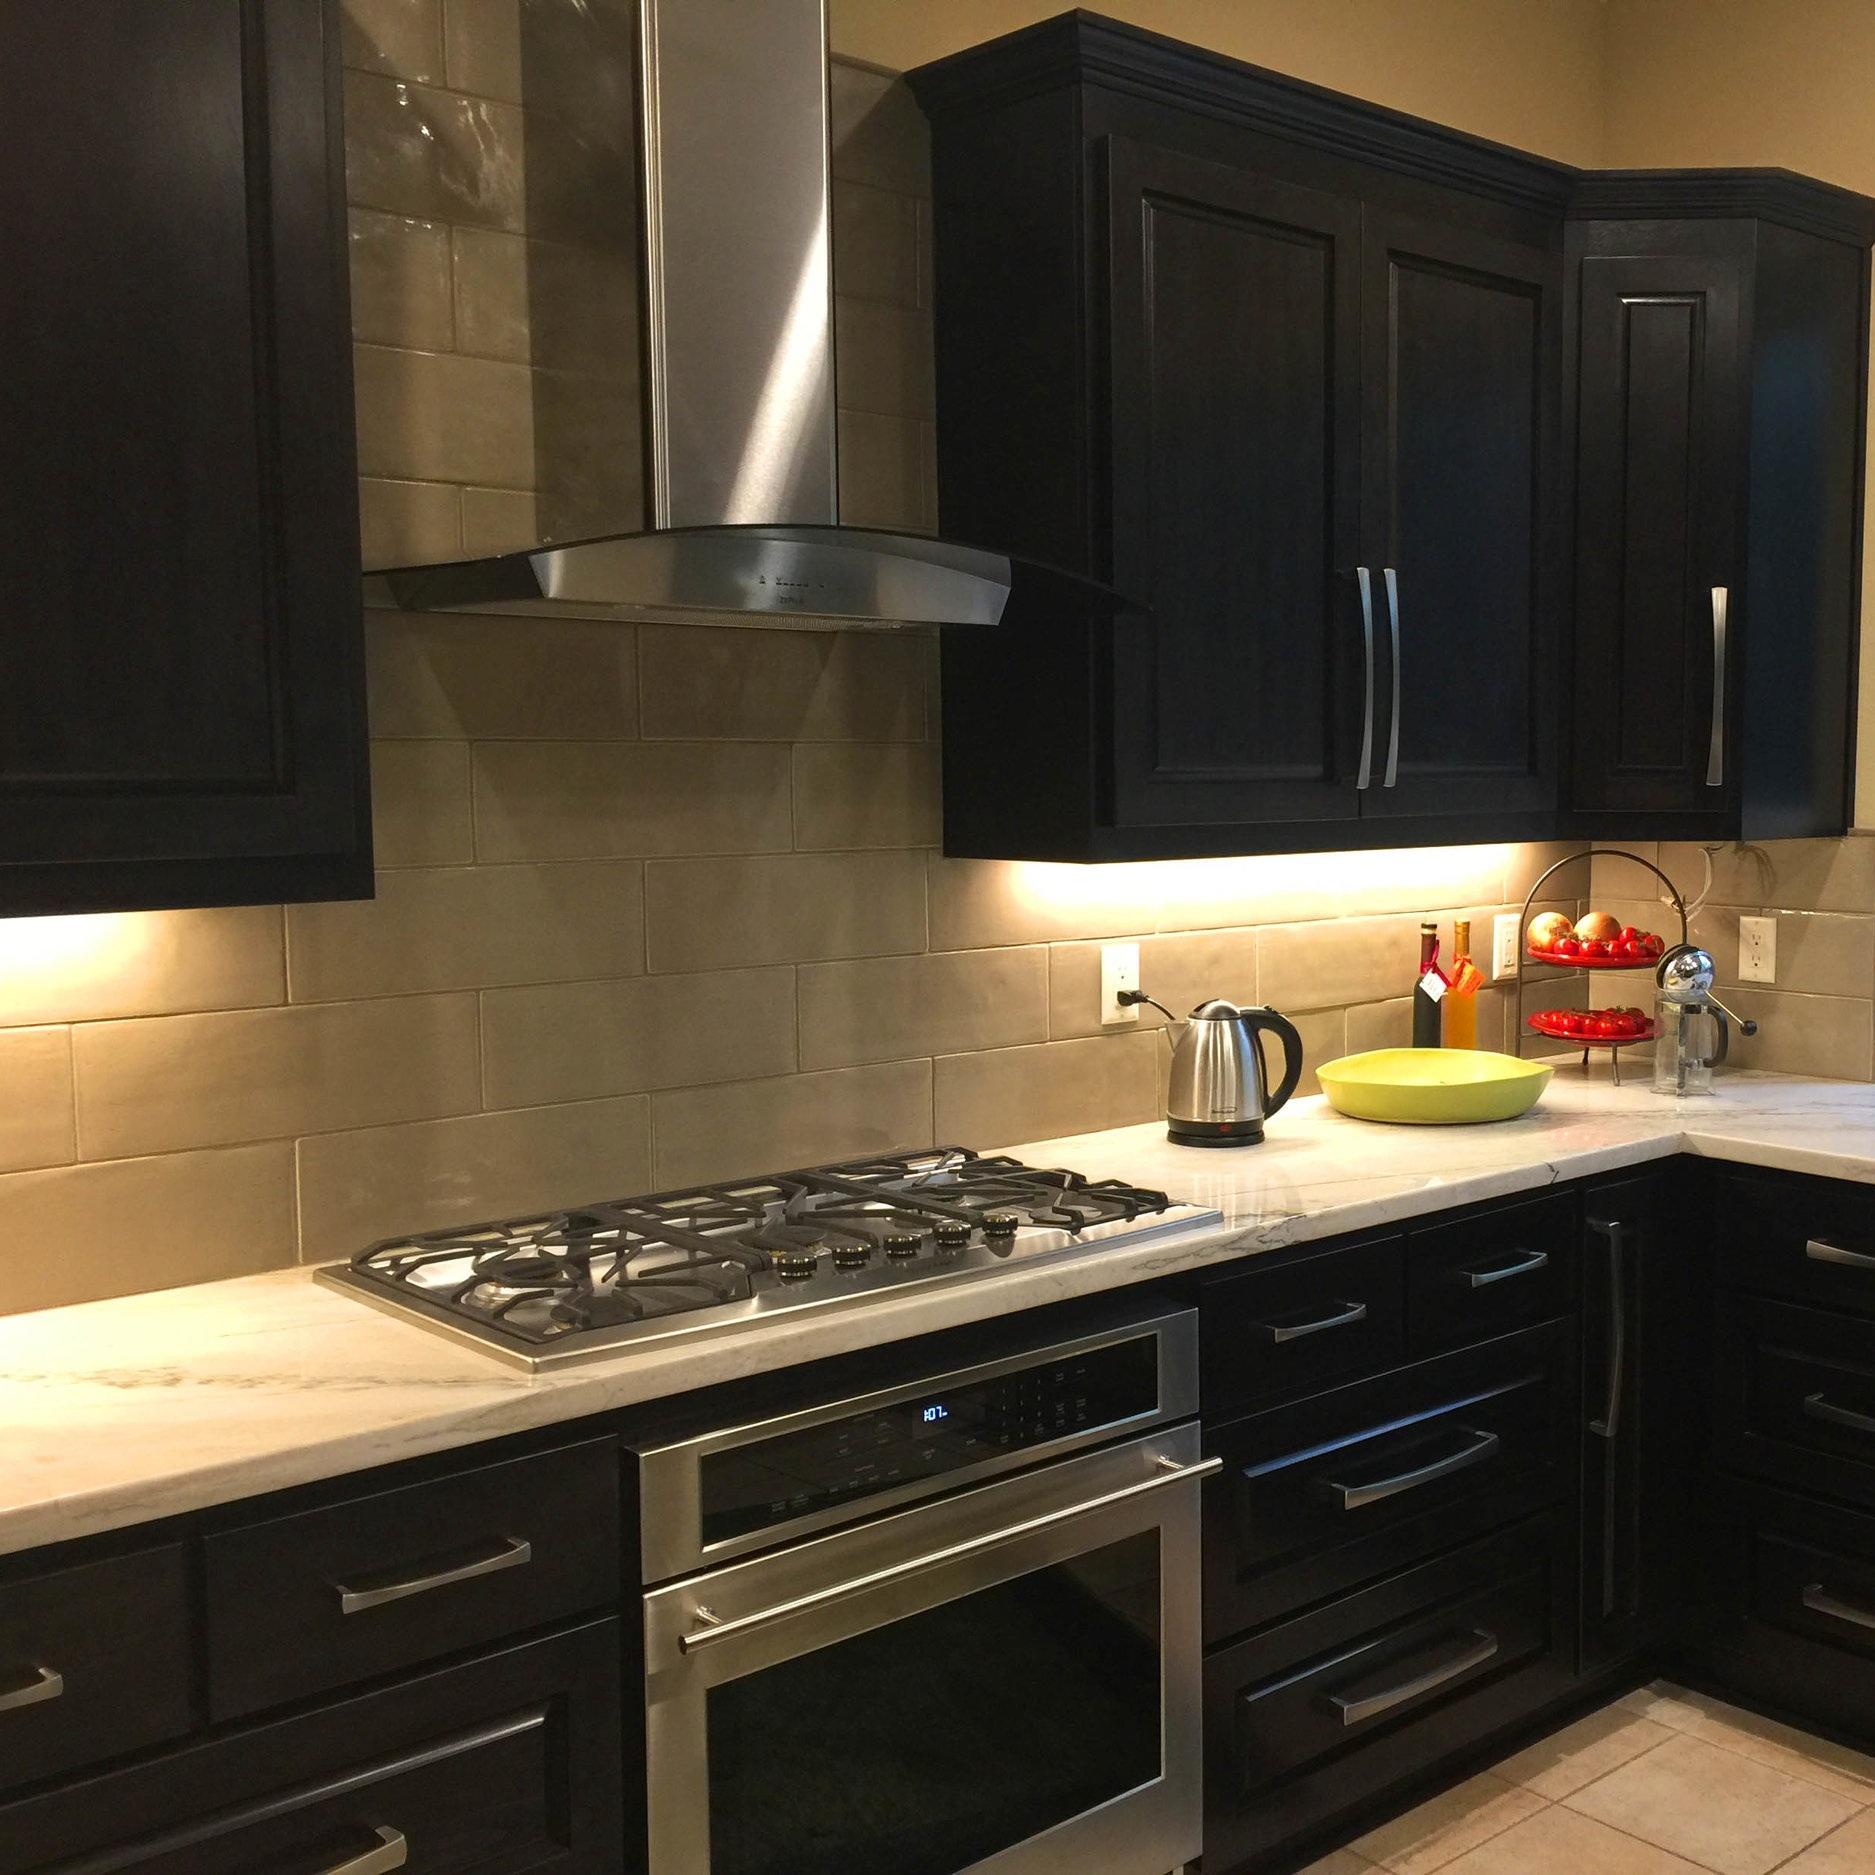 Woodcreek Residence - Modern Kitchen Remodel